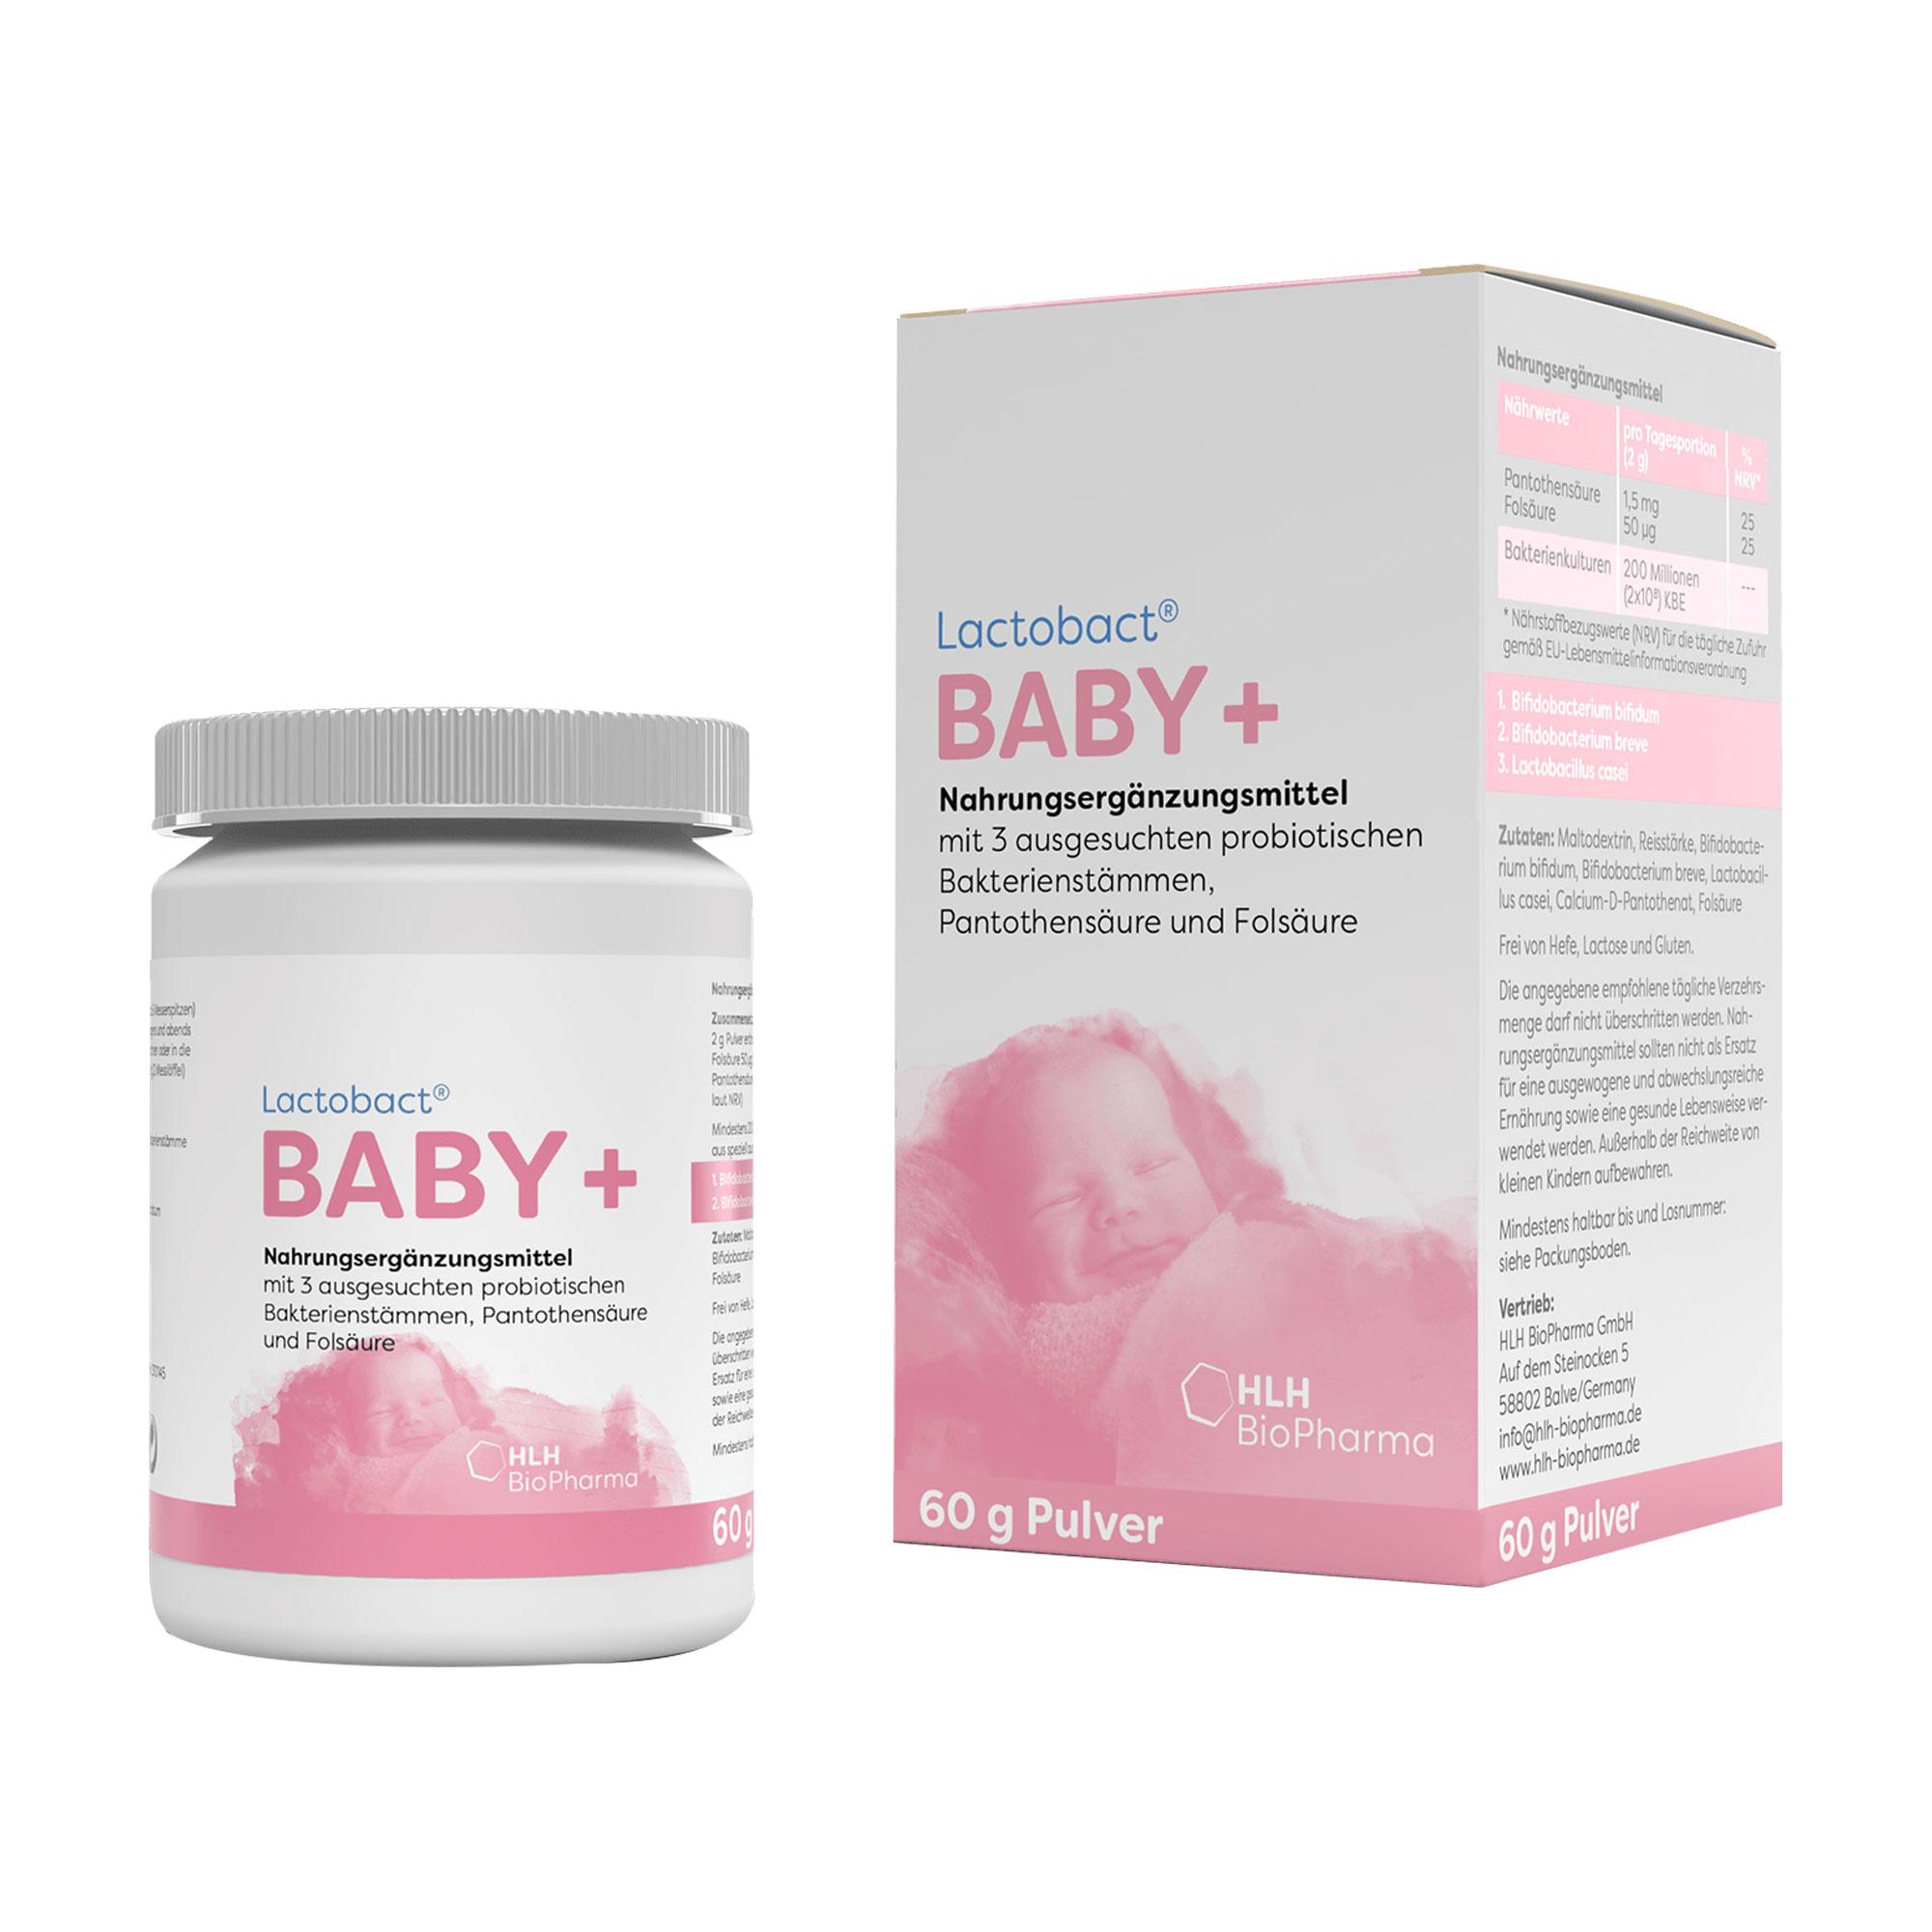 Lactobact Baby Monatspackung